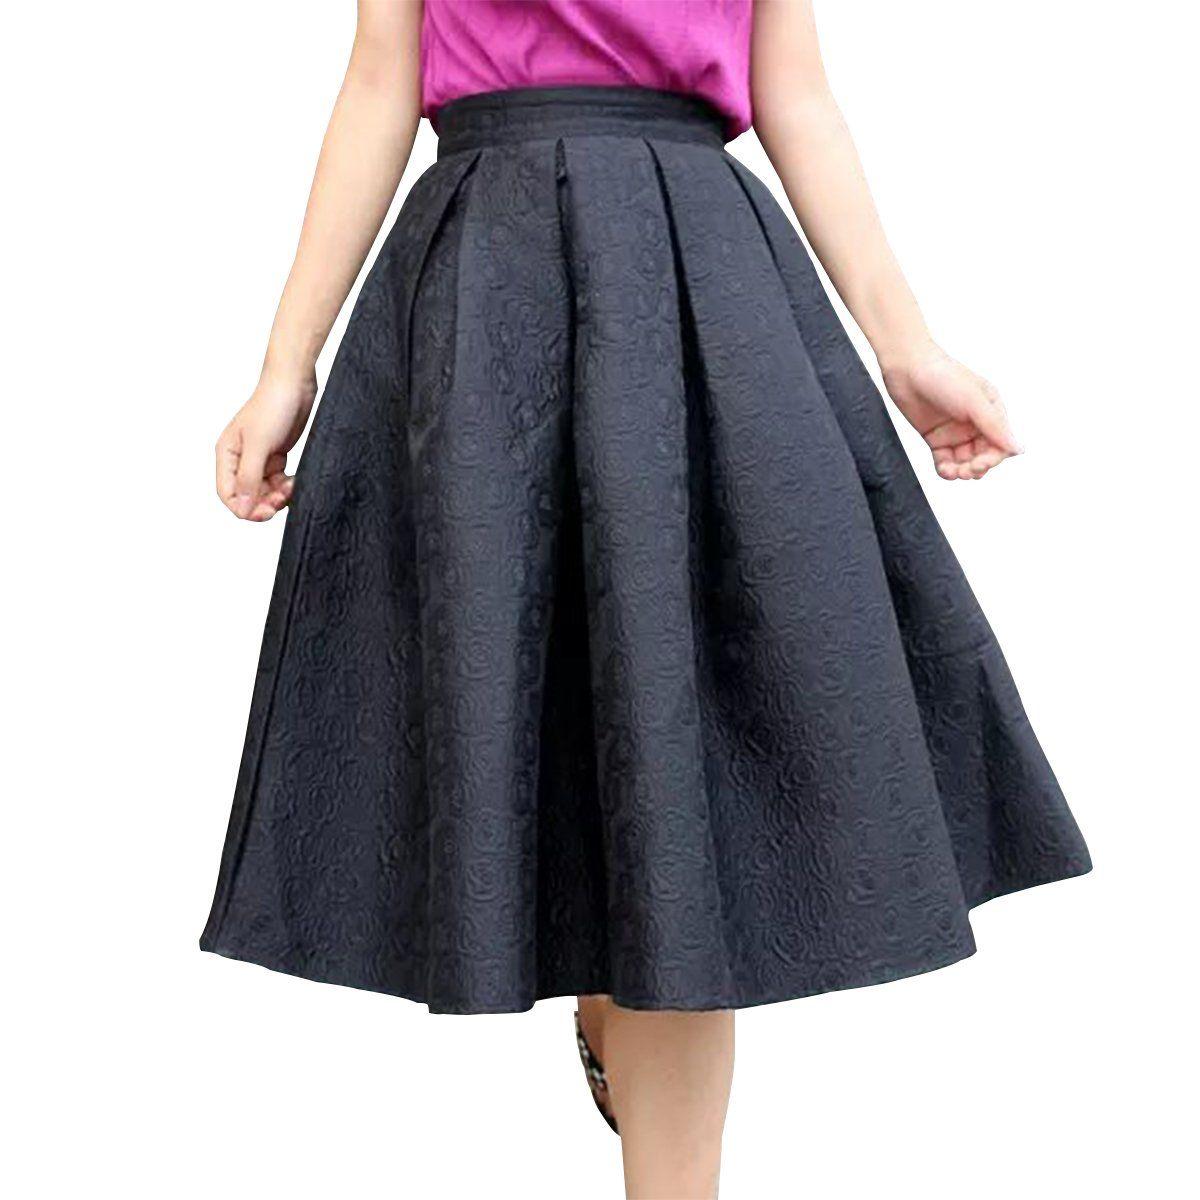 Sue&Joe Women's Flared Skirt A Line Knee Length Plain Swing Pleated Circle Skirt at Amazon Women's Clothing store: